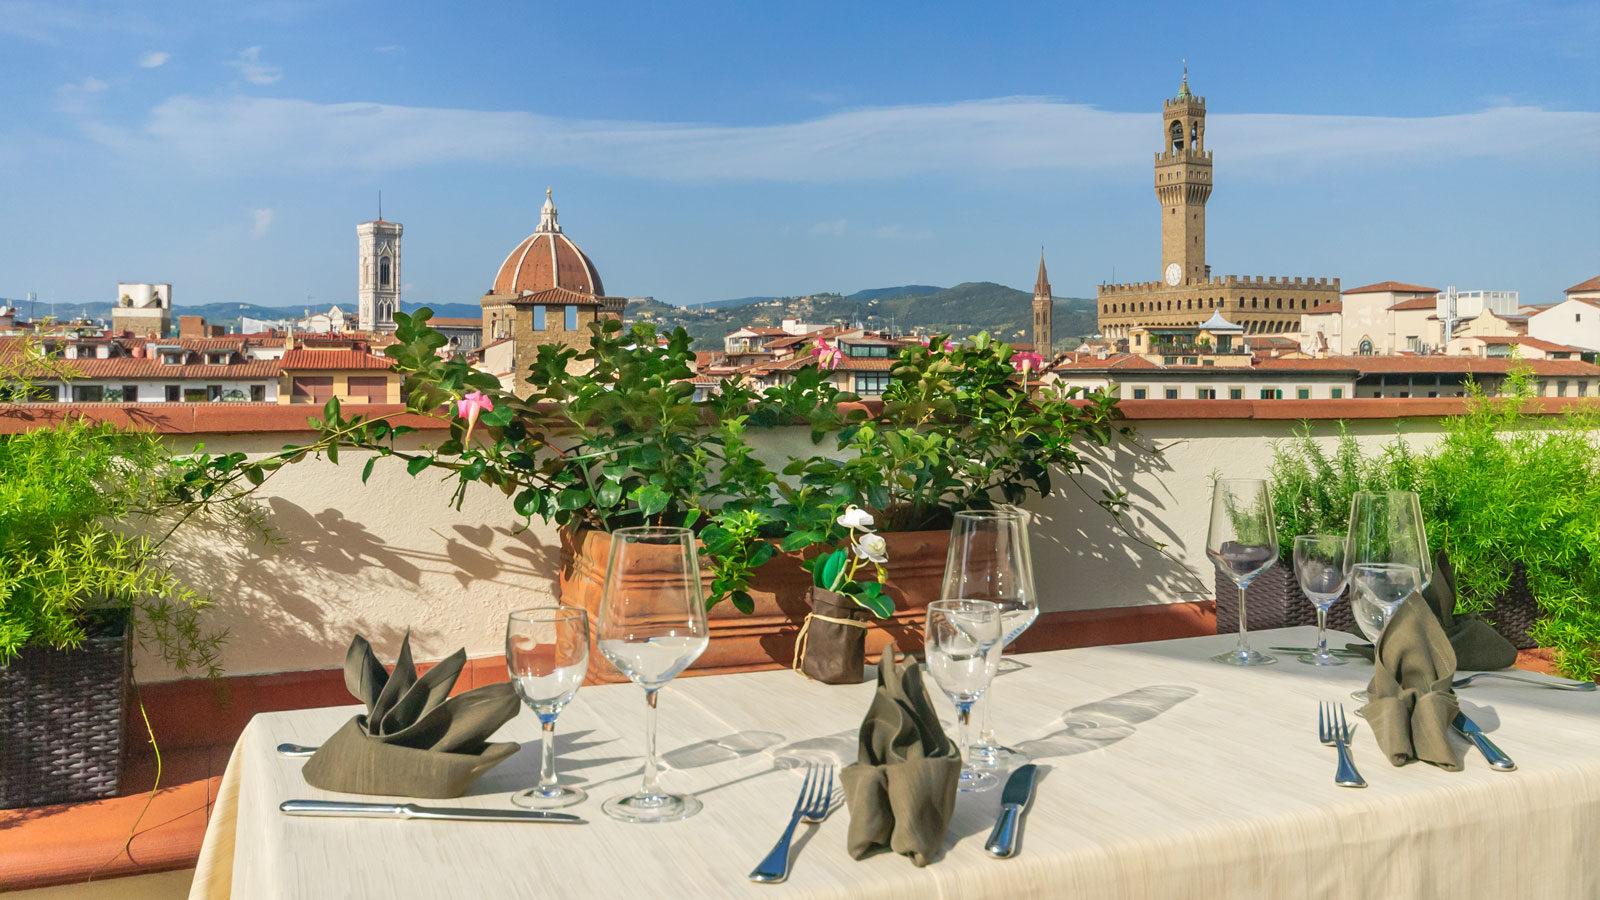 5 alberghi panoramici a Firenze: Hotel Pitti Palace Pontevecchio Firenze (Toscana, Italia)